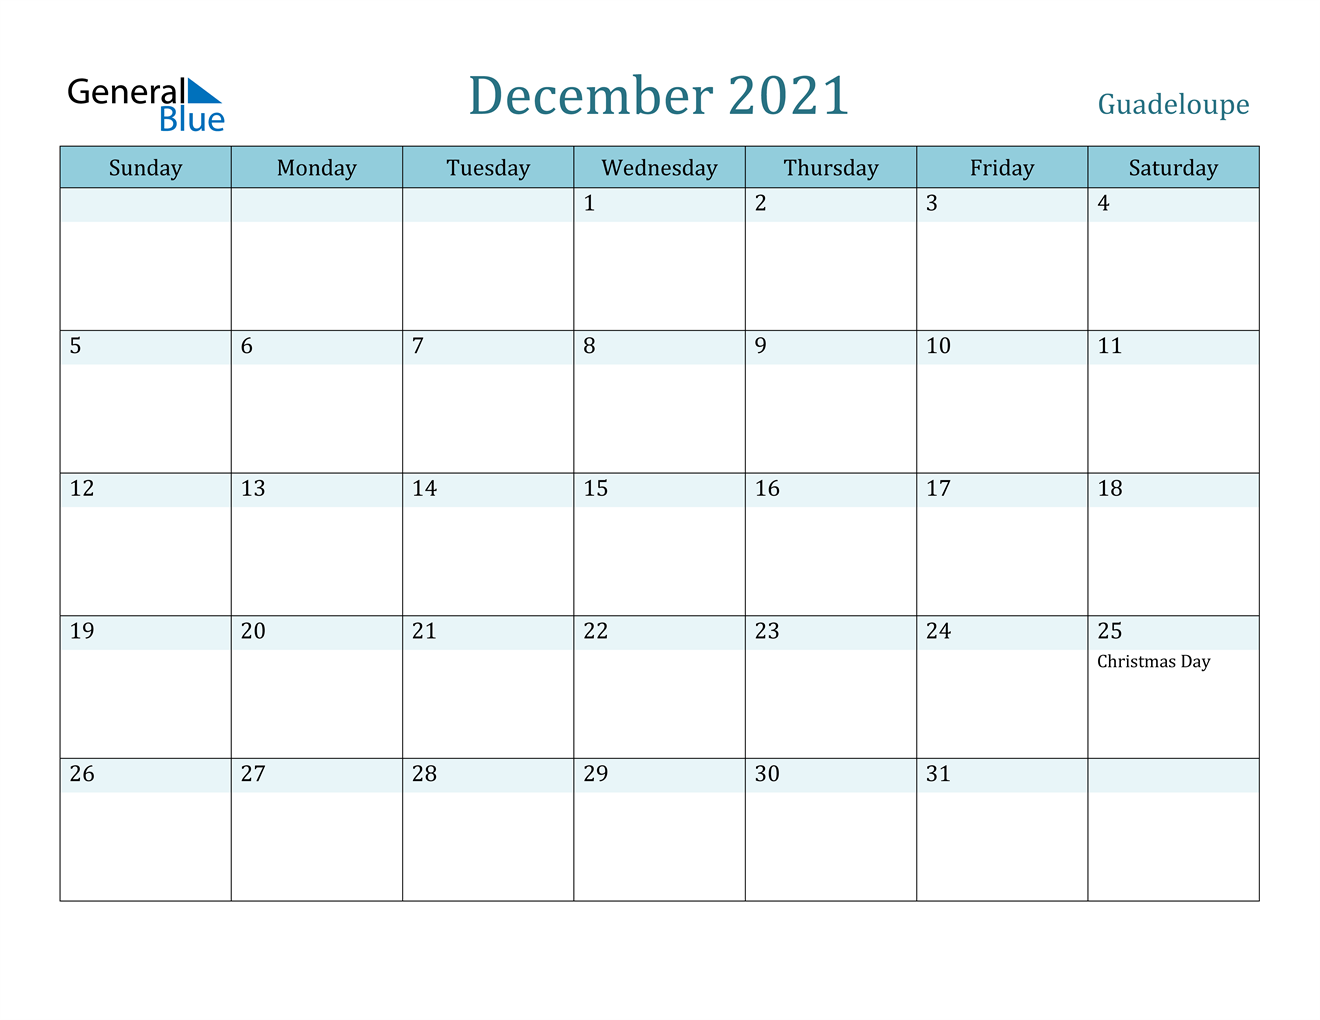 December 2021 Calendar - Guadeloupe